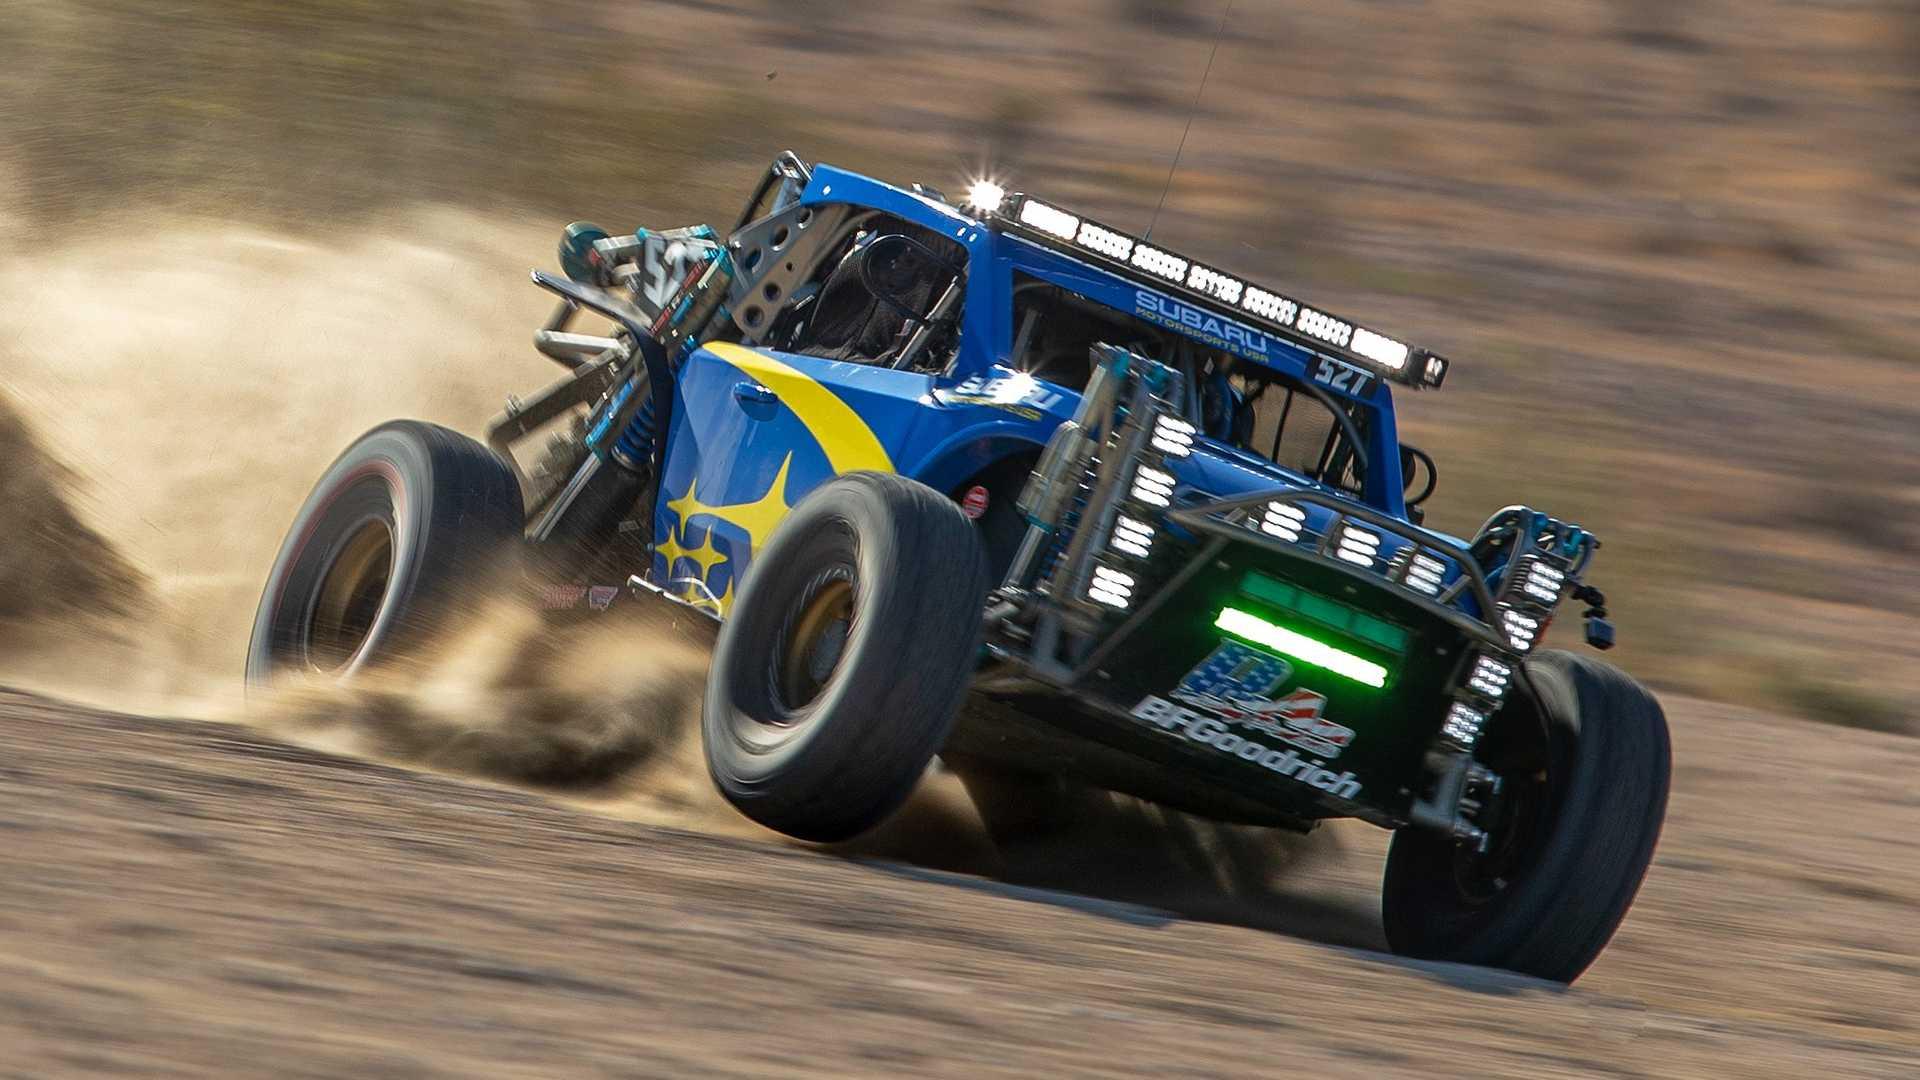 subaru-crosstrek-desert-racer-looks-ready-to-beat-baja_3